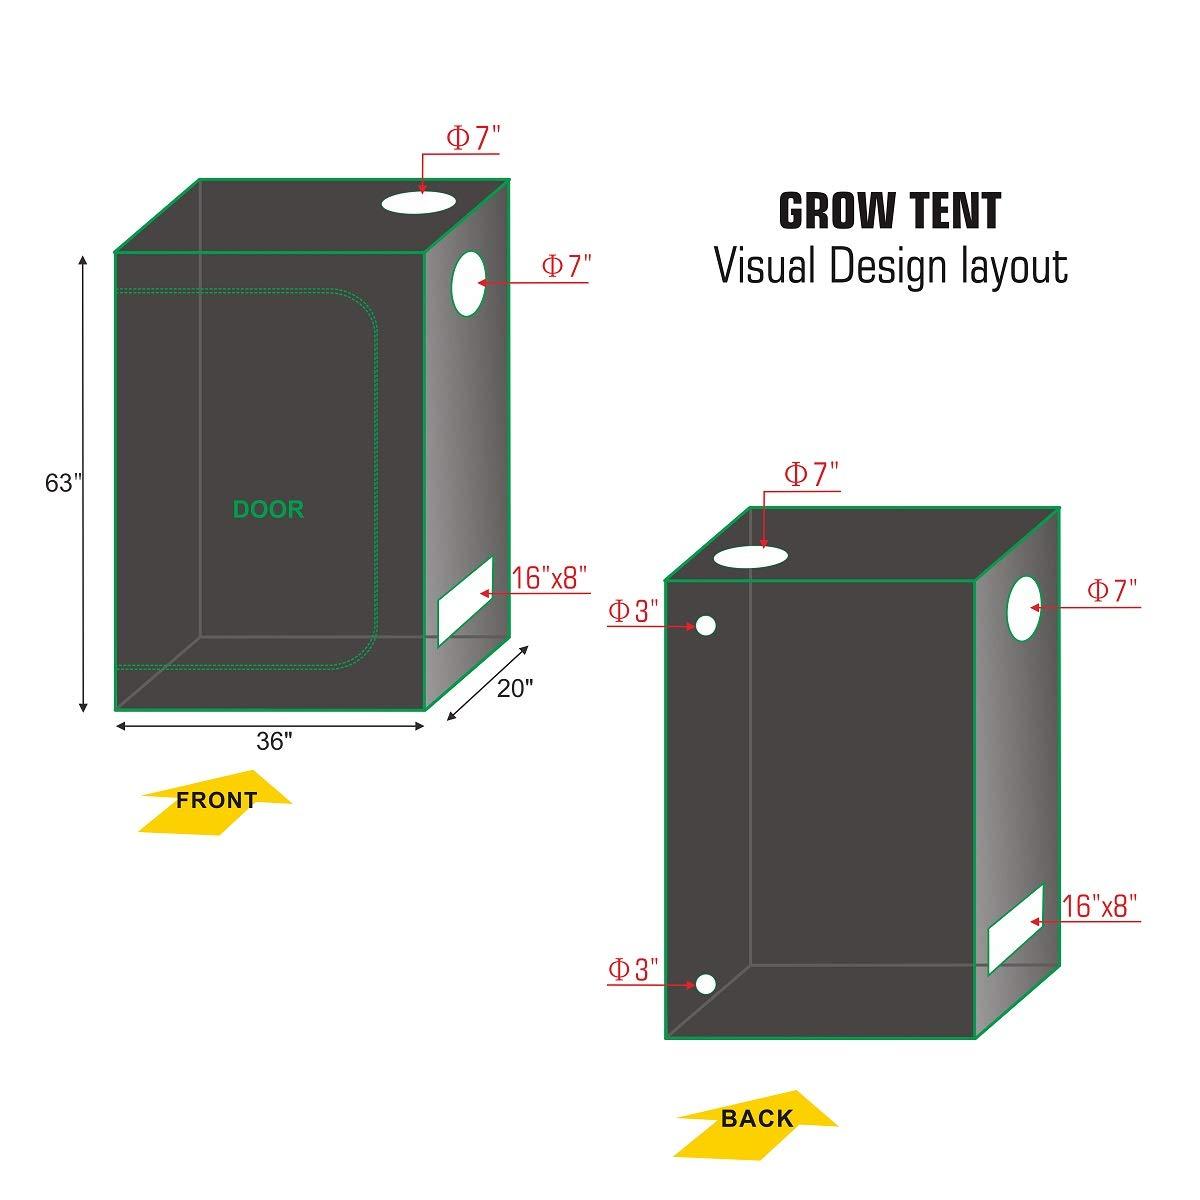 Hydro Plus Grow Tent Complete Kit LED 300W Grow Light 4 Fan Filter Ventilation Kit 36 x20 x63 Grow Tent Setup Hydroponics Indoor Plants Growing System LED300W 36 x20 x63 4 Filter Kit